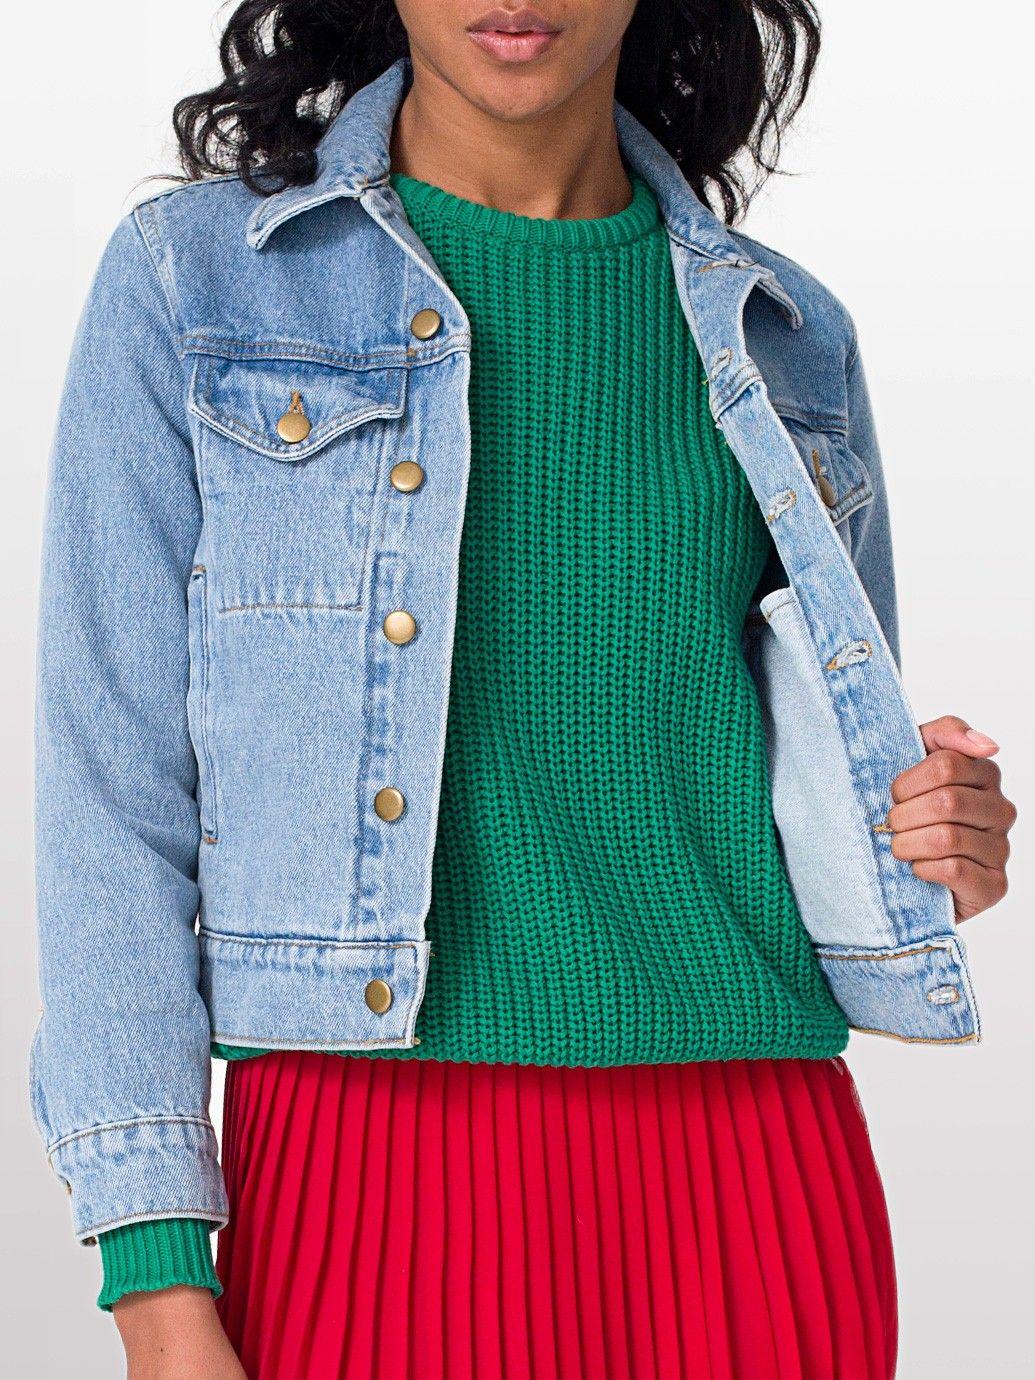 Unisex Denim Jacket | Denim | New & Now's Women | American Apparel